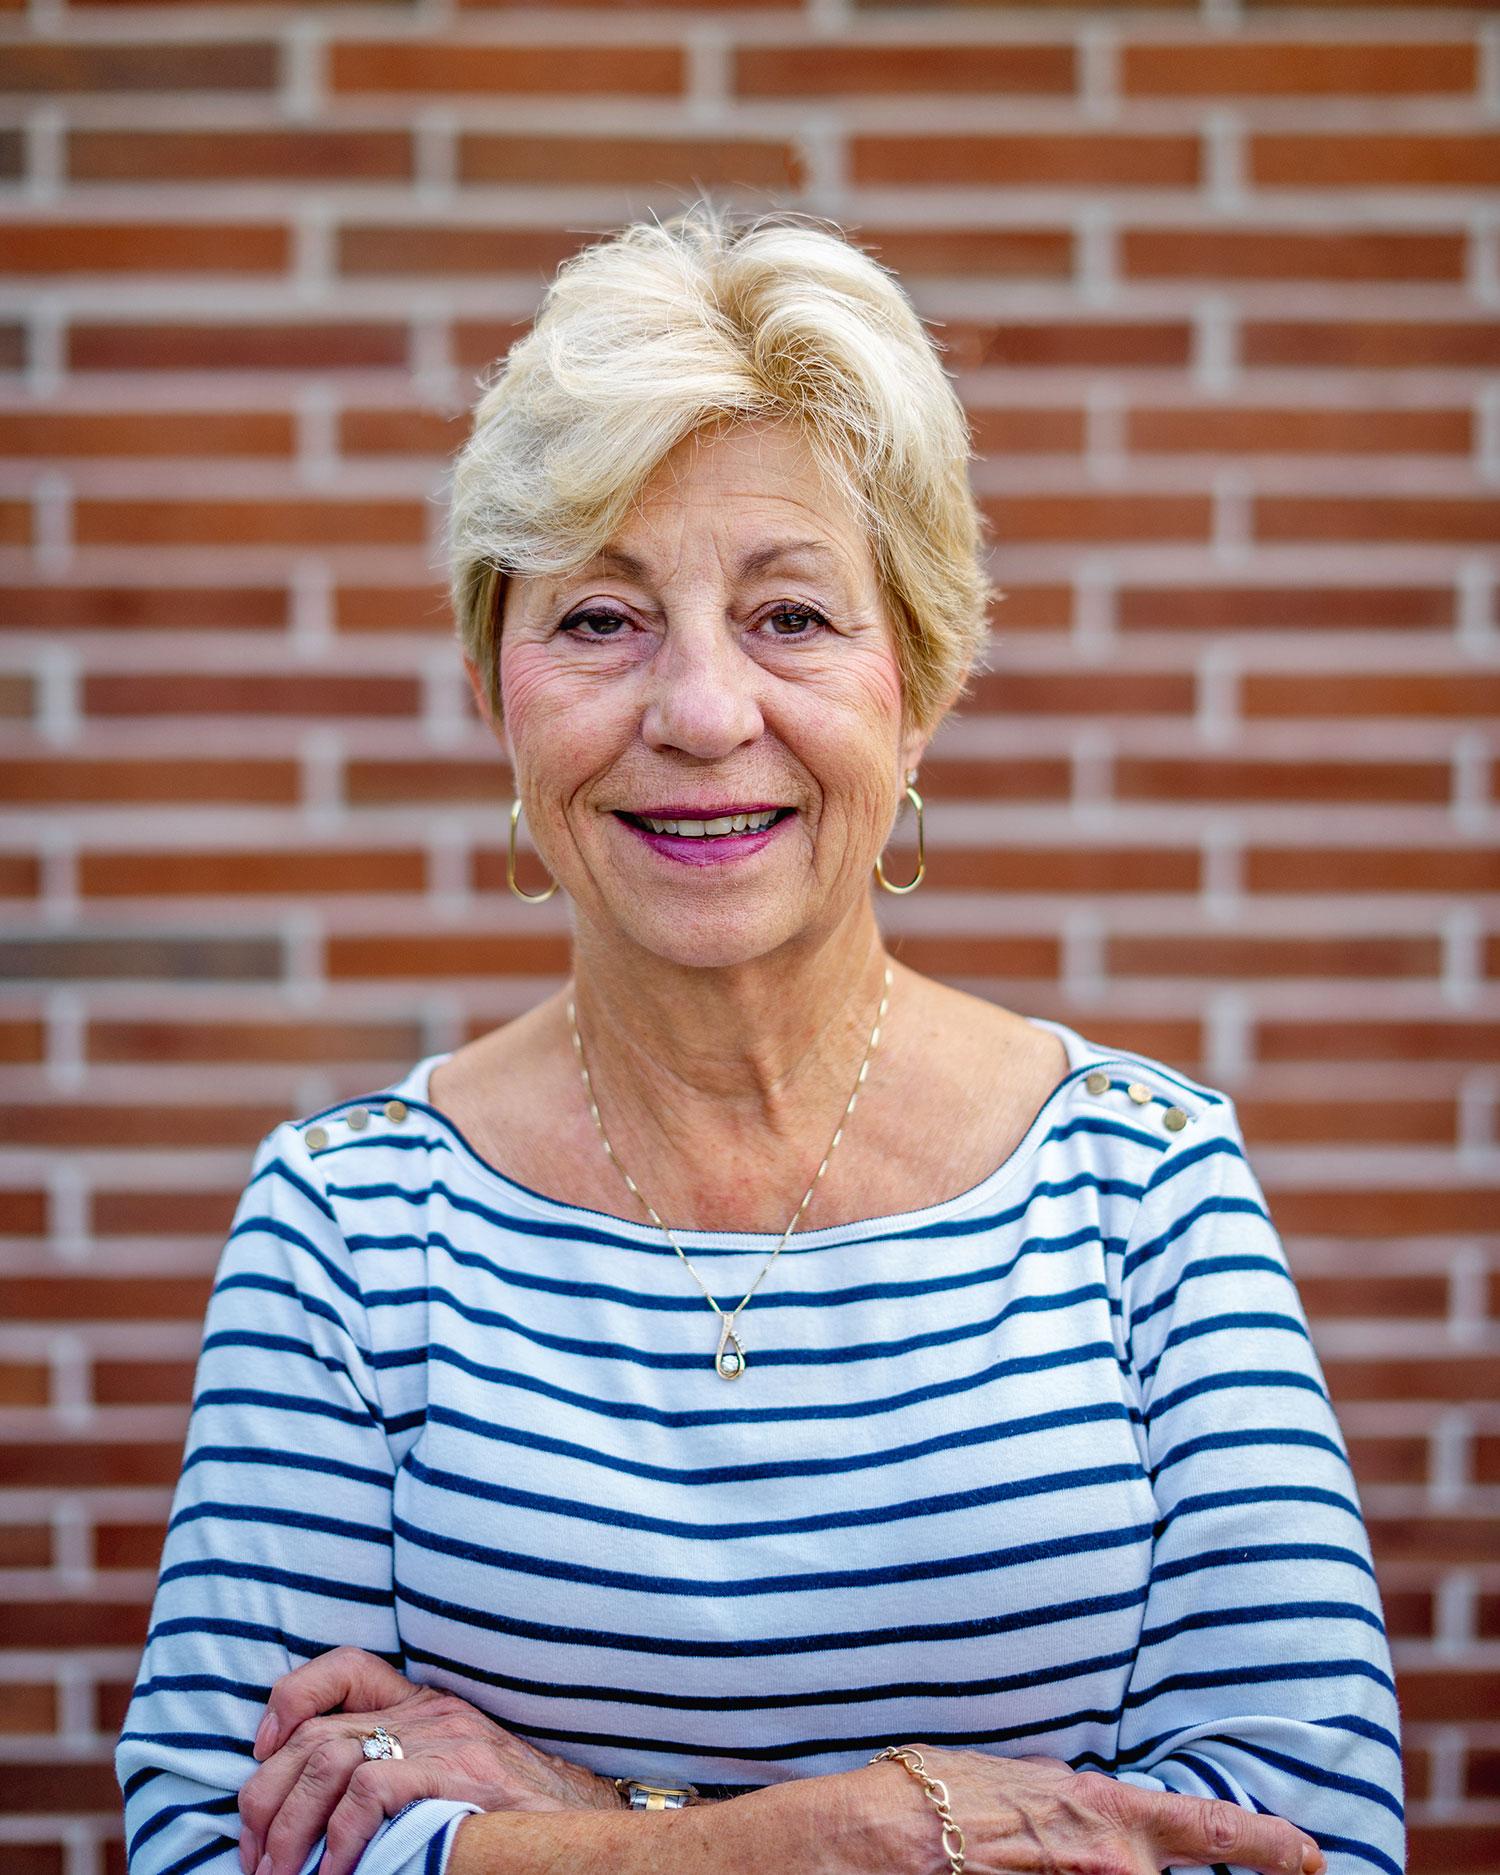 Susan Bigham